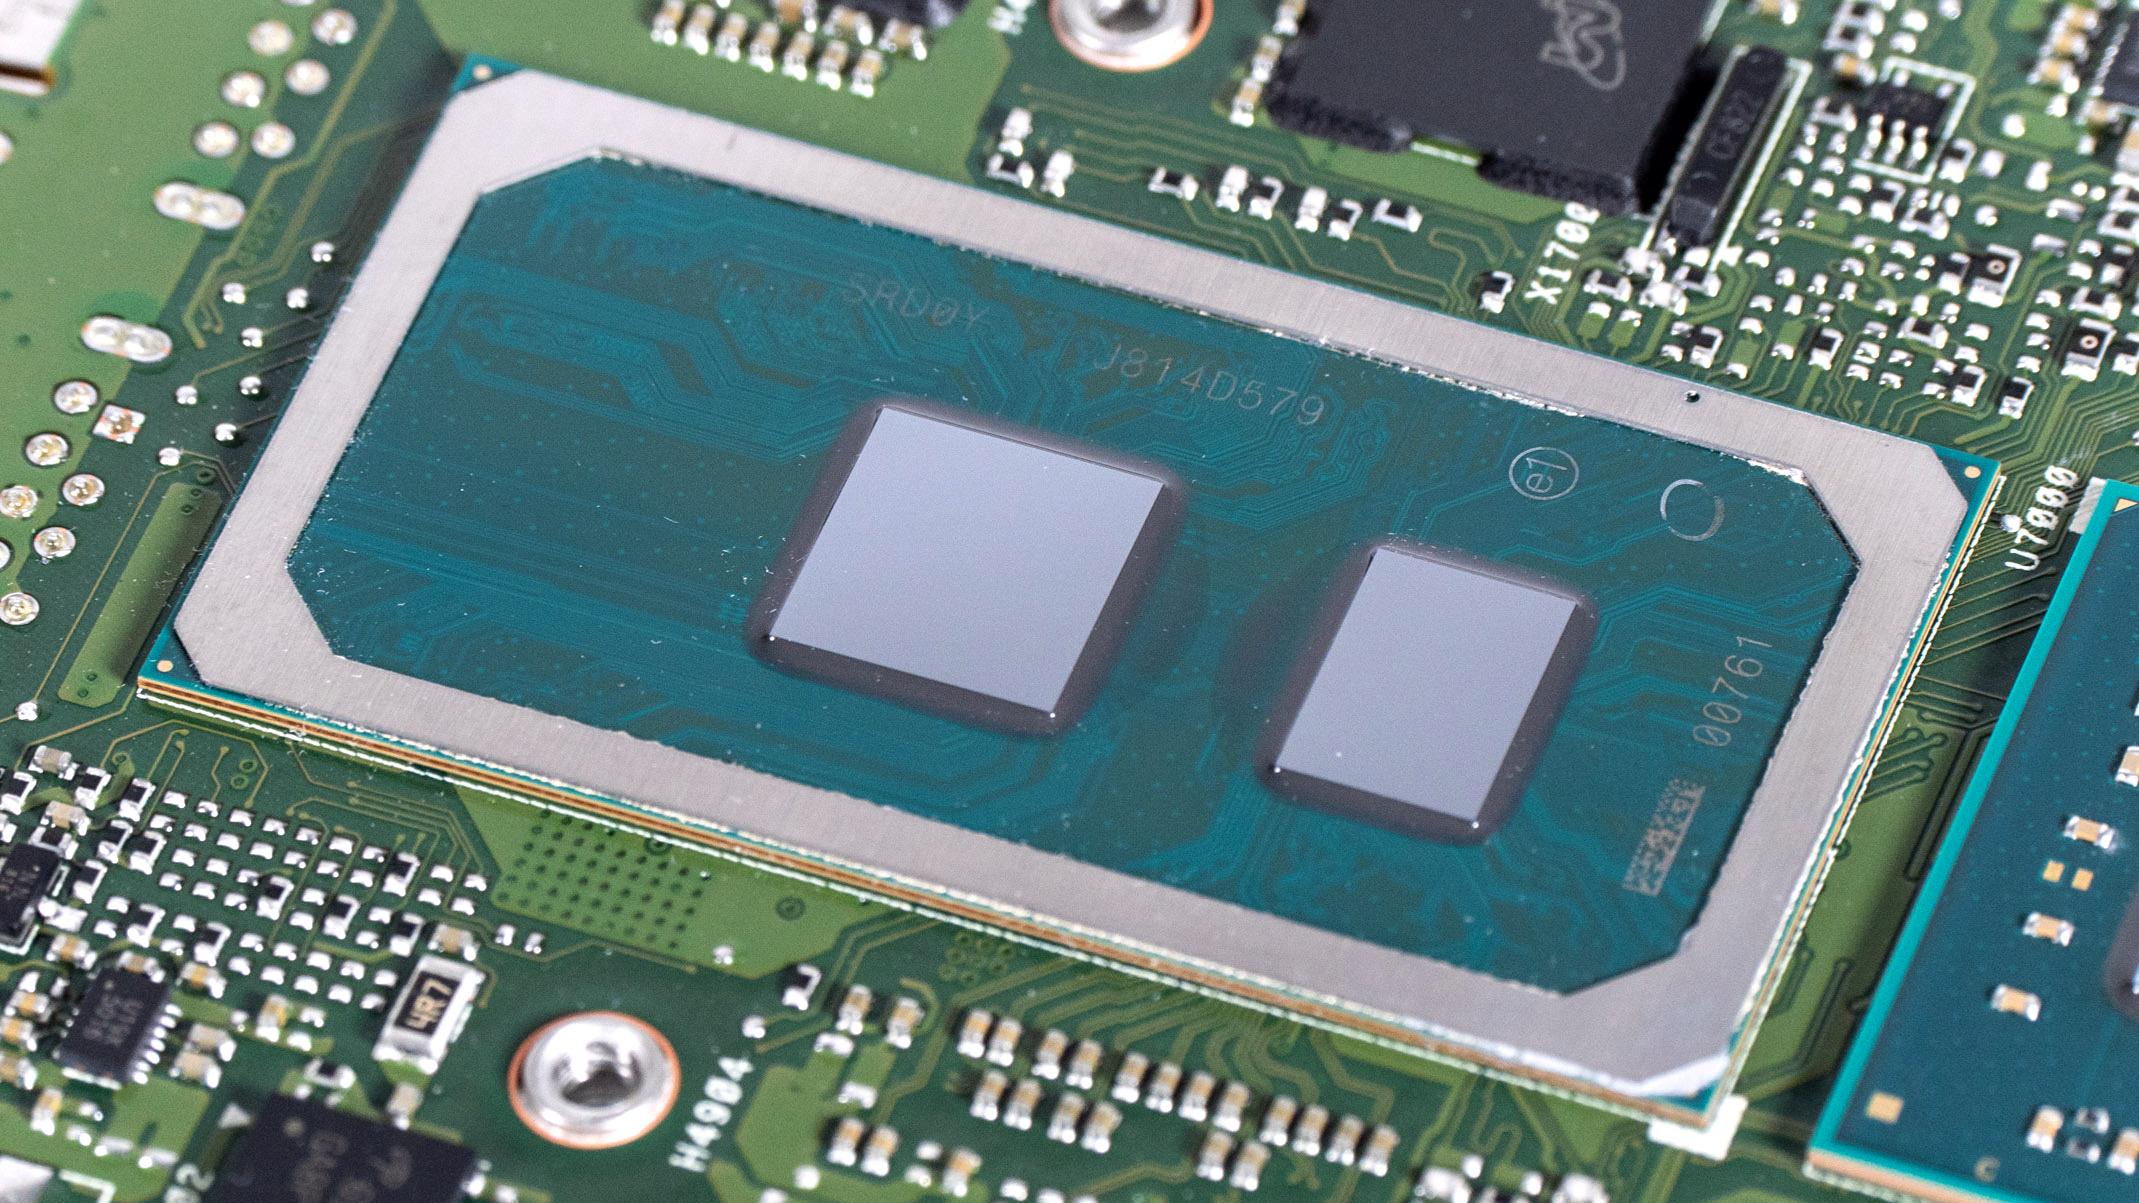 NUC8 (Crimson Canyon) im Test: AMD rettet Intels 10-nm-Minirechner - Links der Cannon-Lake-Prozessor, rechts der Chipsatz (Bild: Marc Sauter/Golem.de)